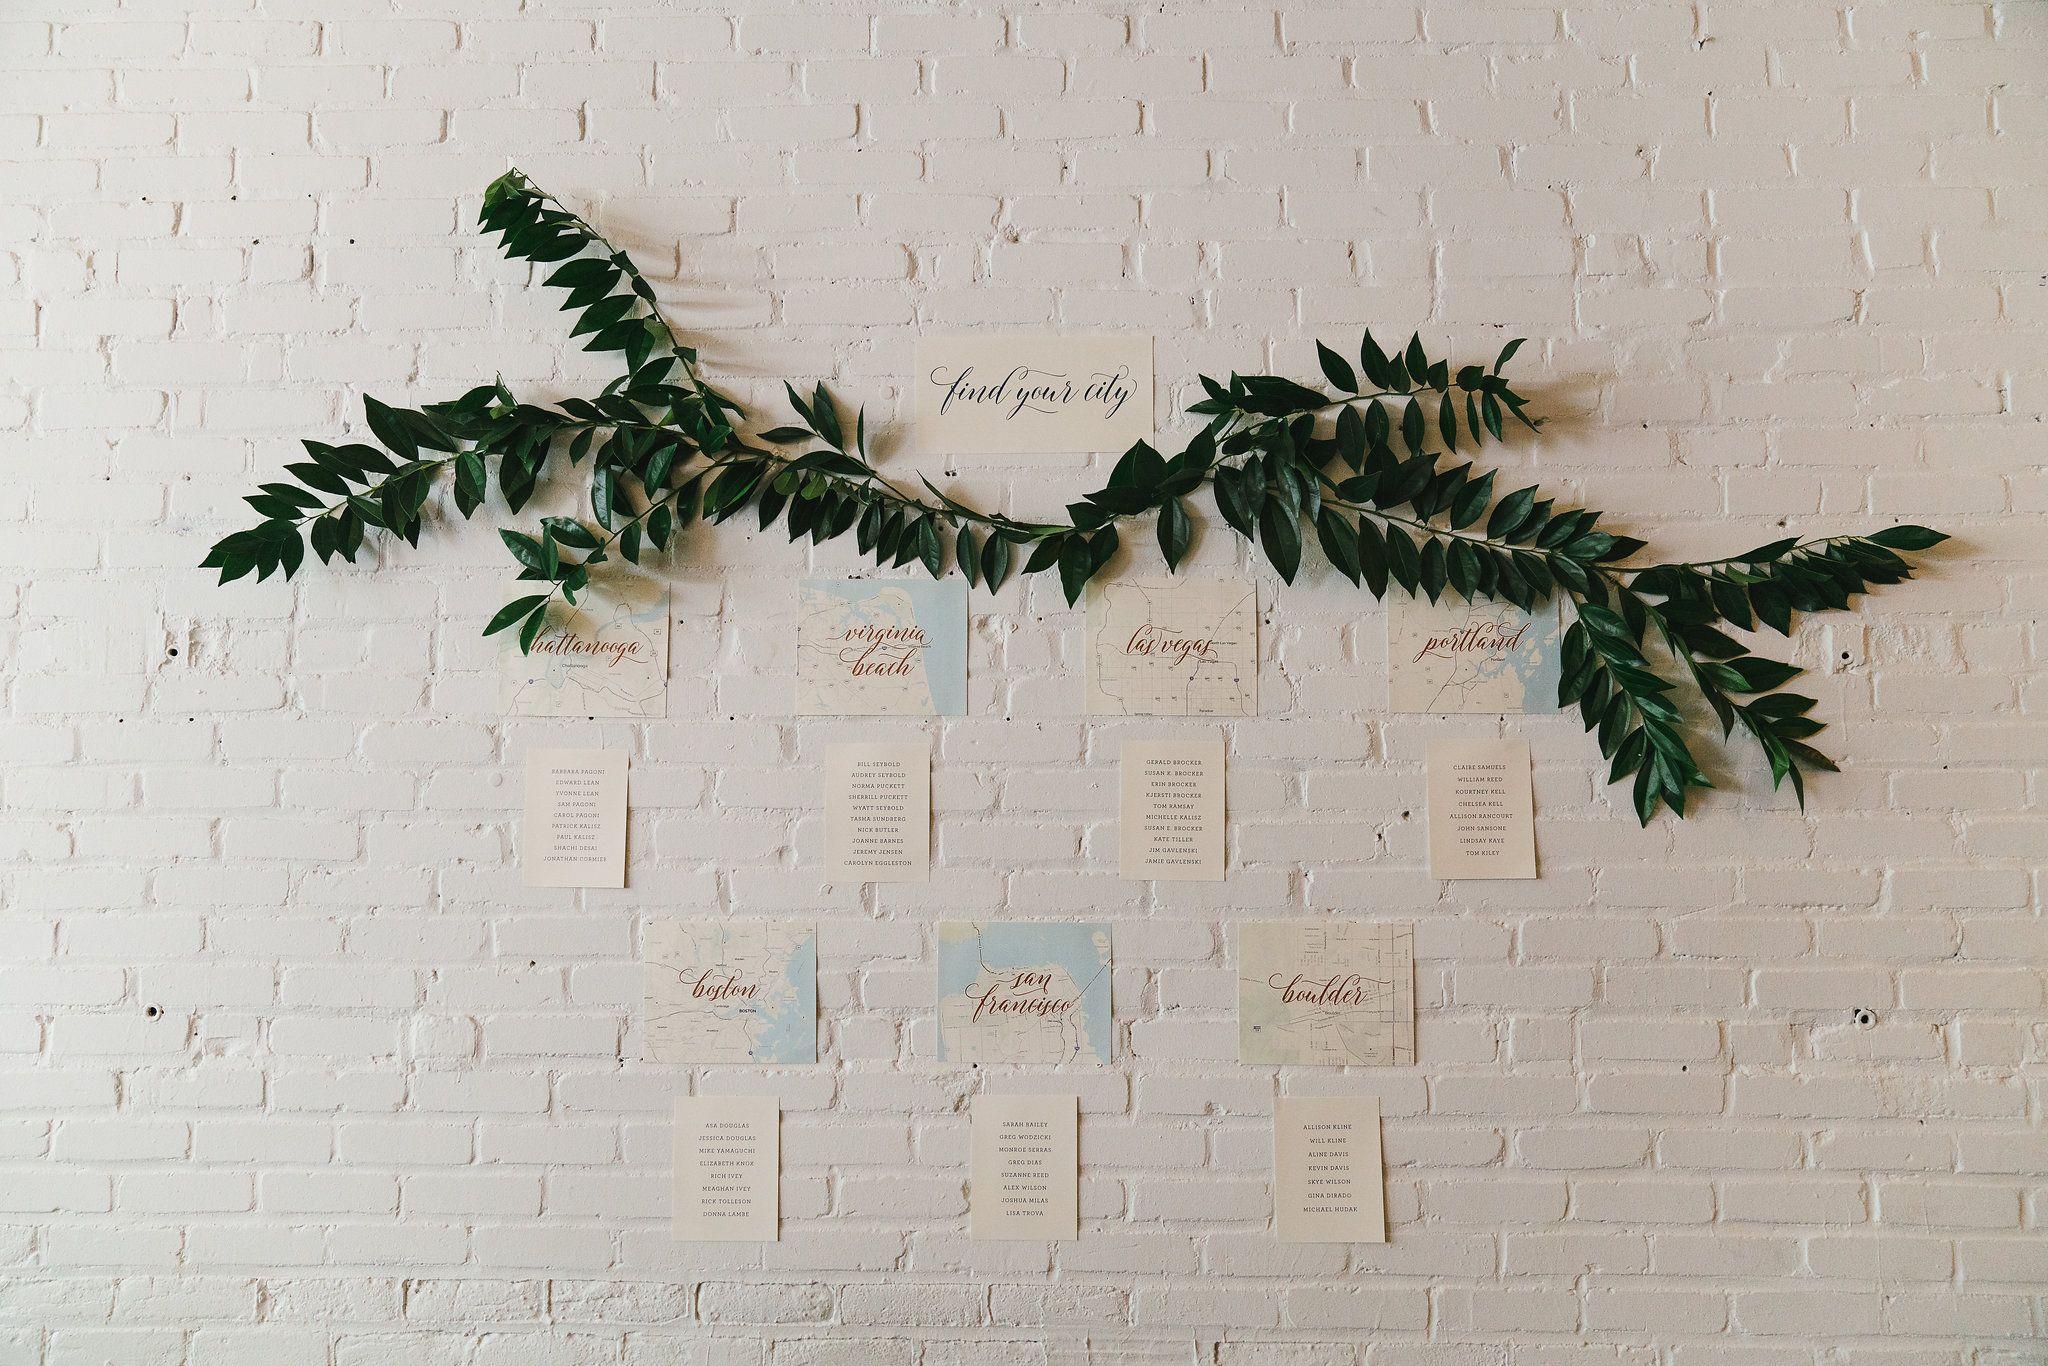 Warehouse Xi Marit John Wedding Wedding Planner New England